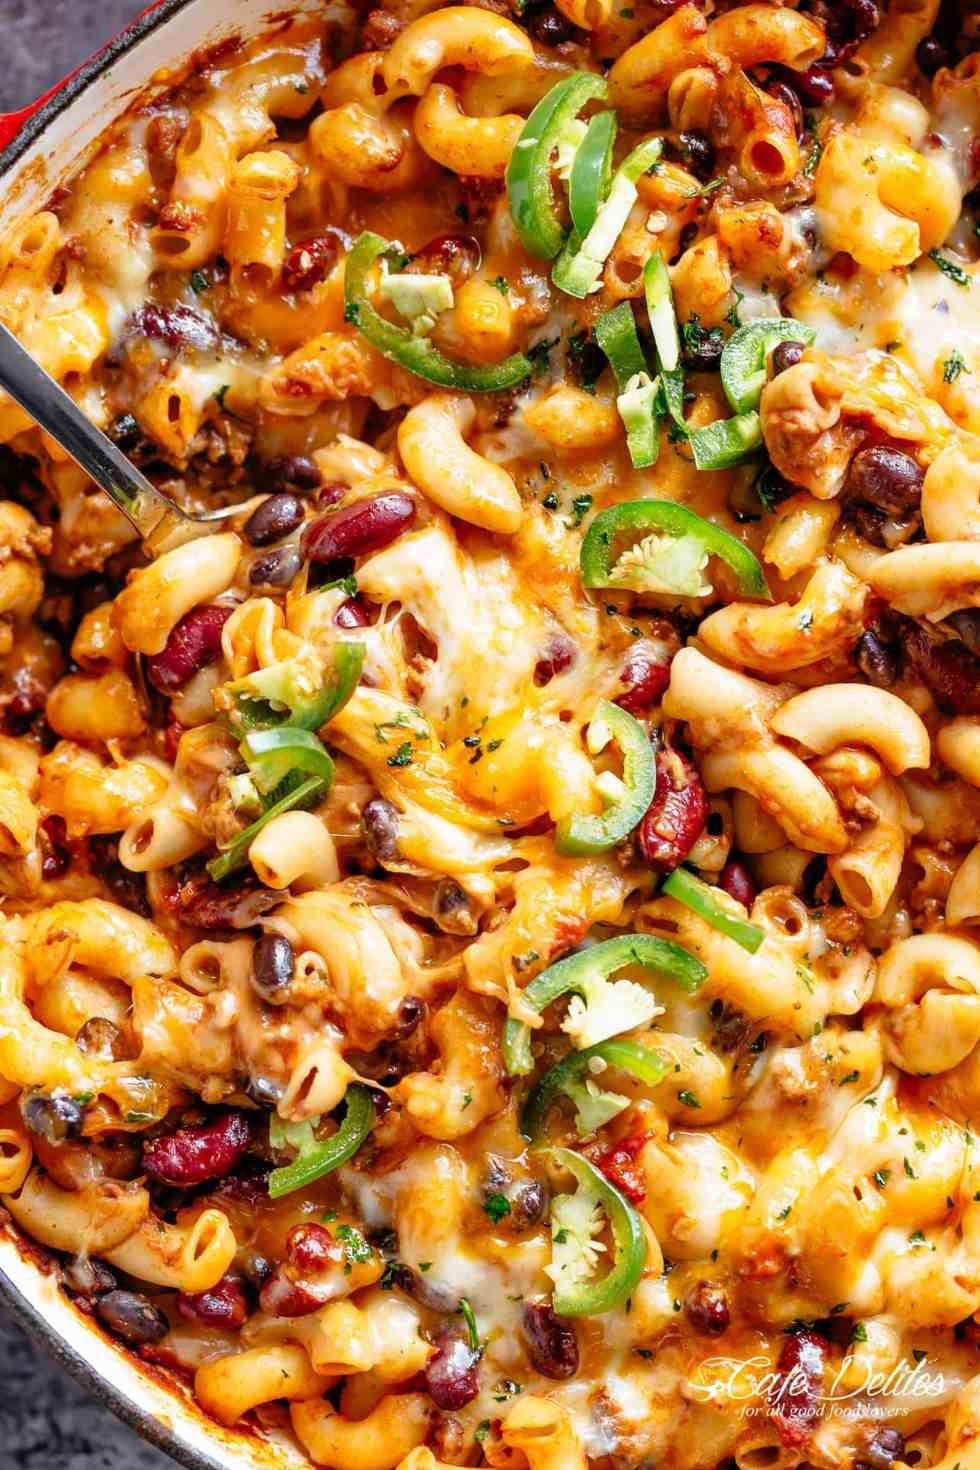 Cheesy Chili Mac and Cheese | cafedelites.com